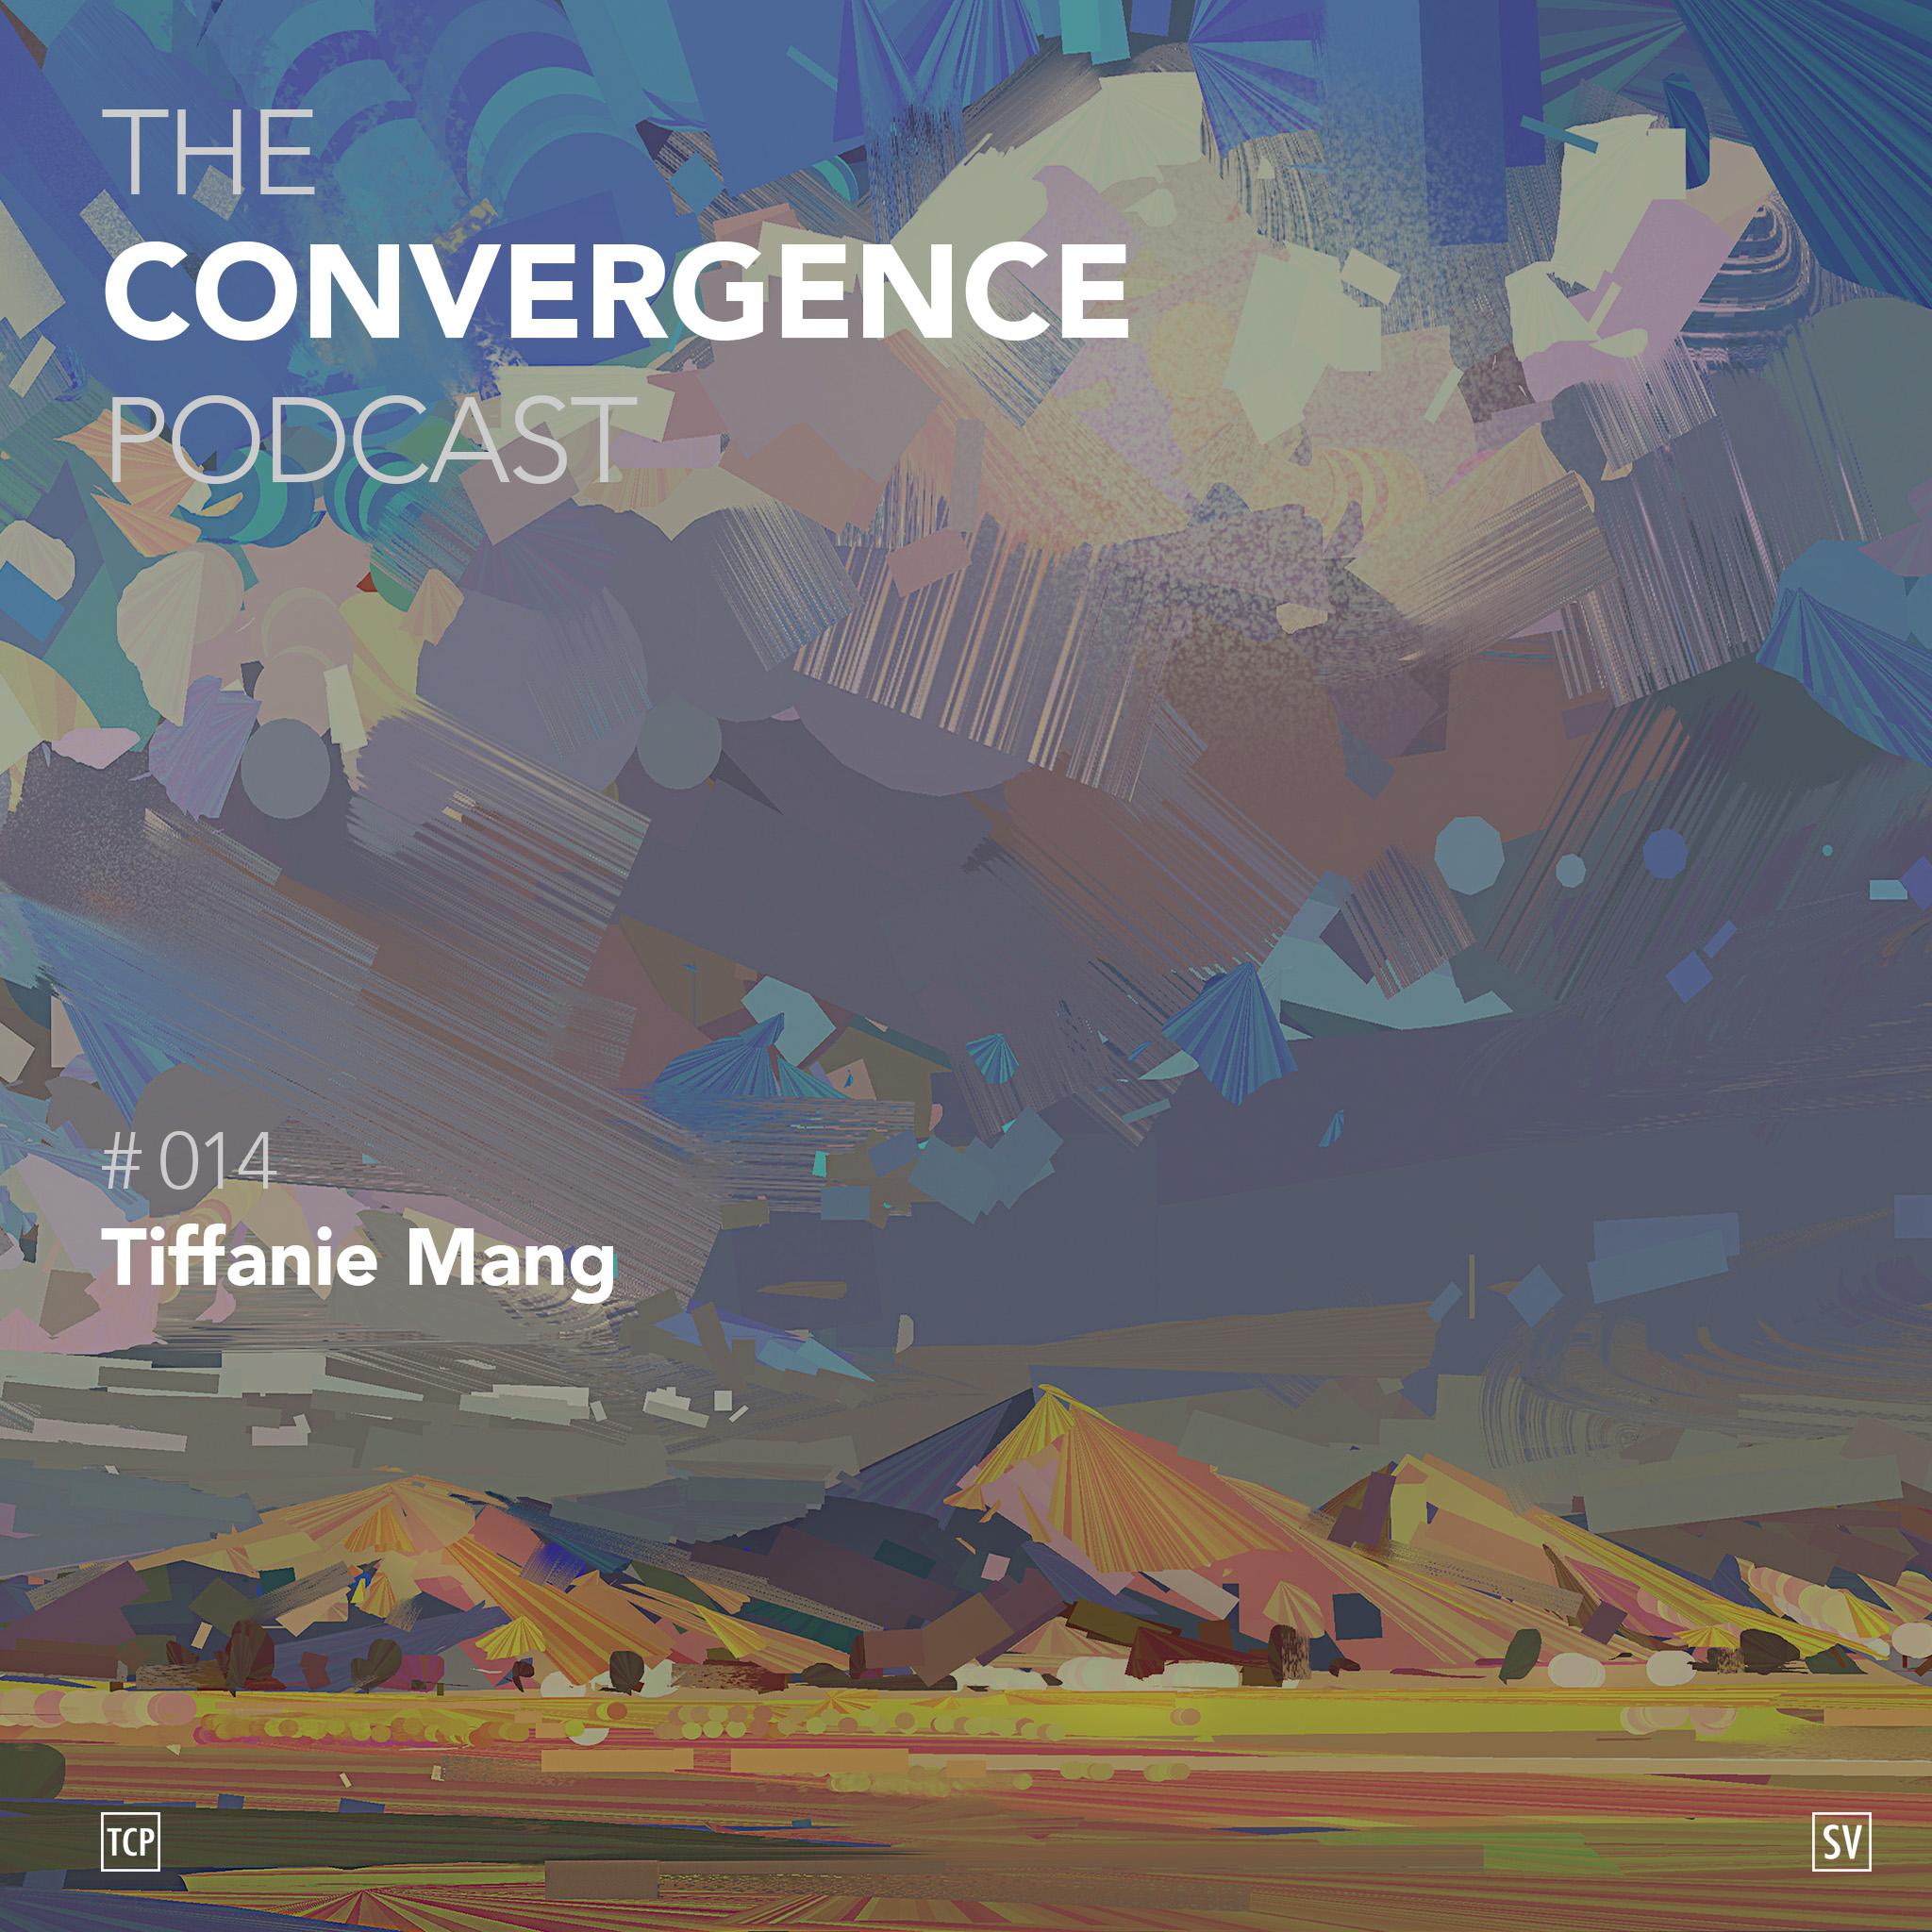 TheConvergencePodcast#014_Tiffanie Mang